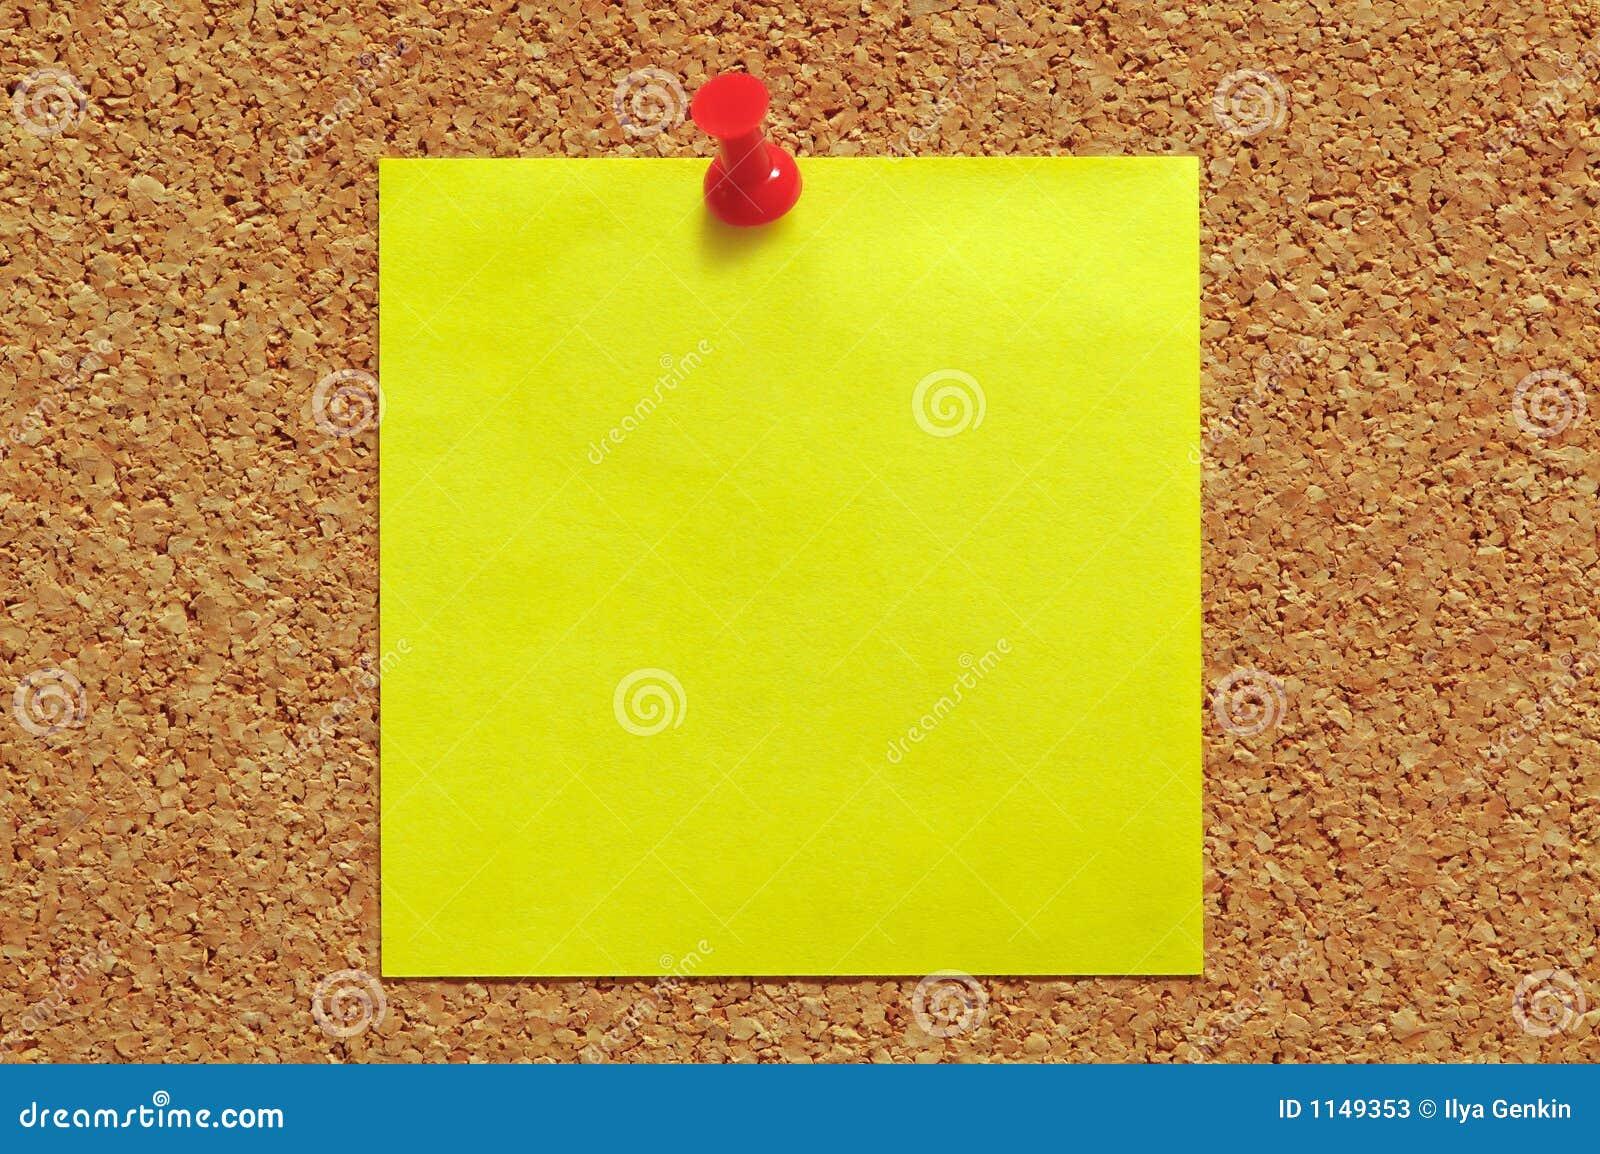 Blank Post-It Note on Pin Board (JPG)   OnlyGFX.com